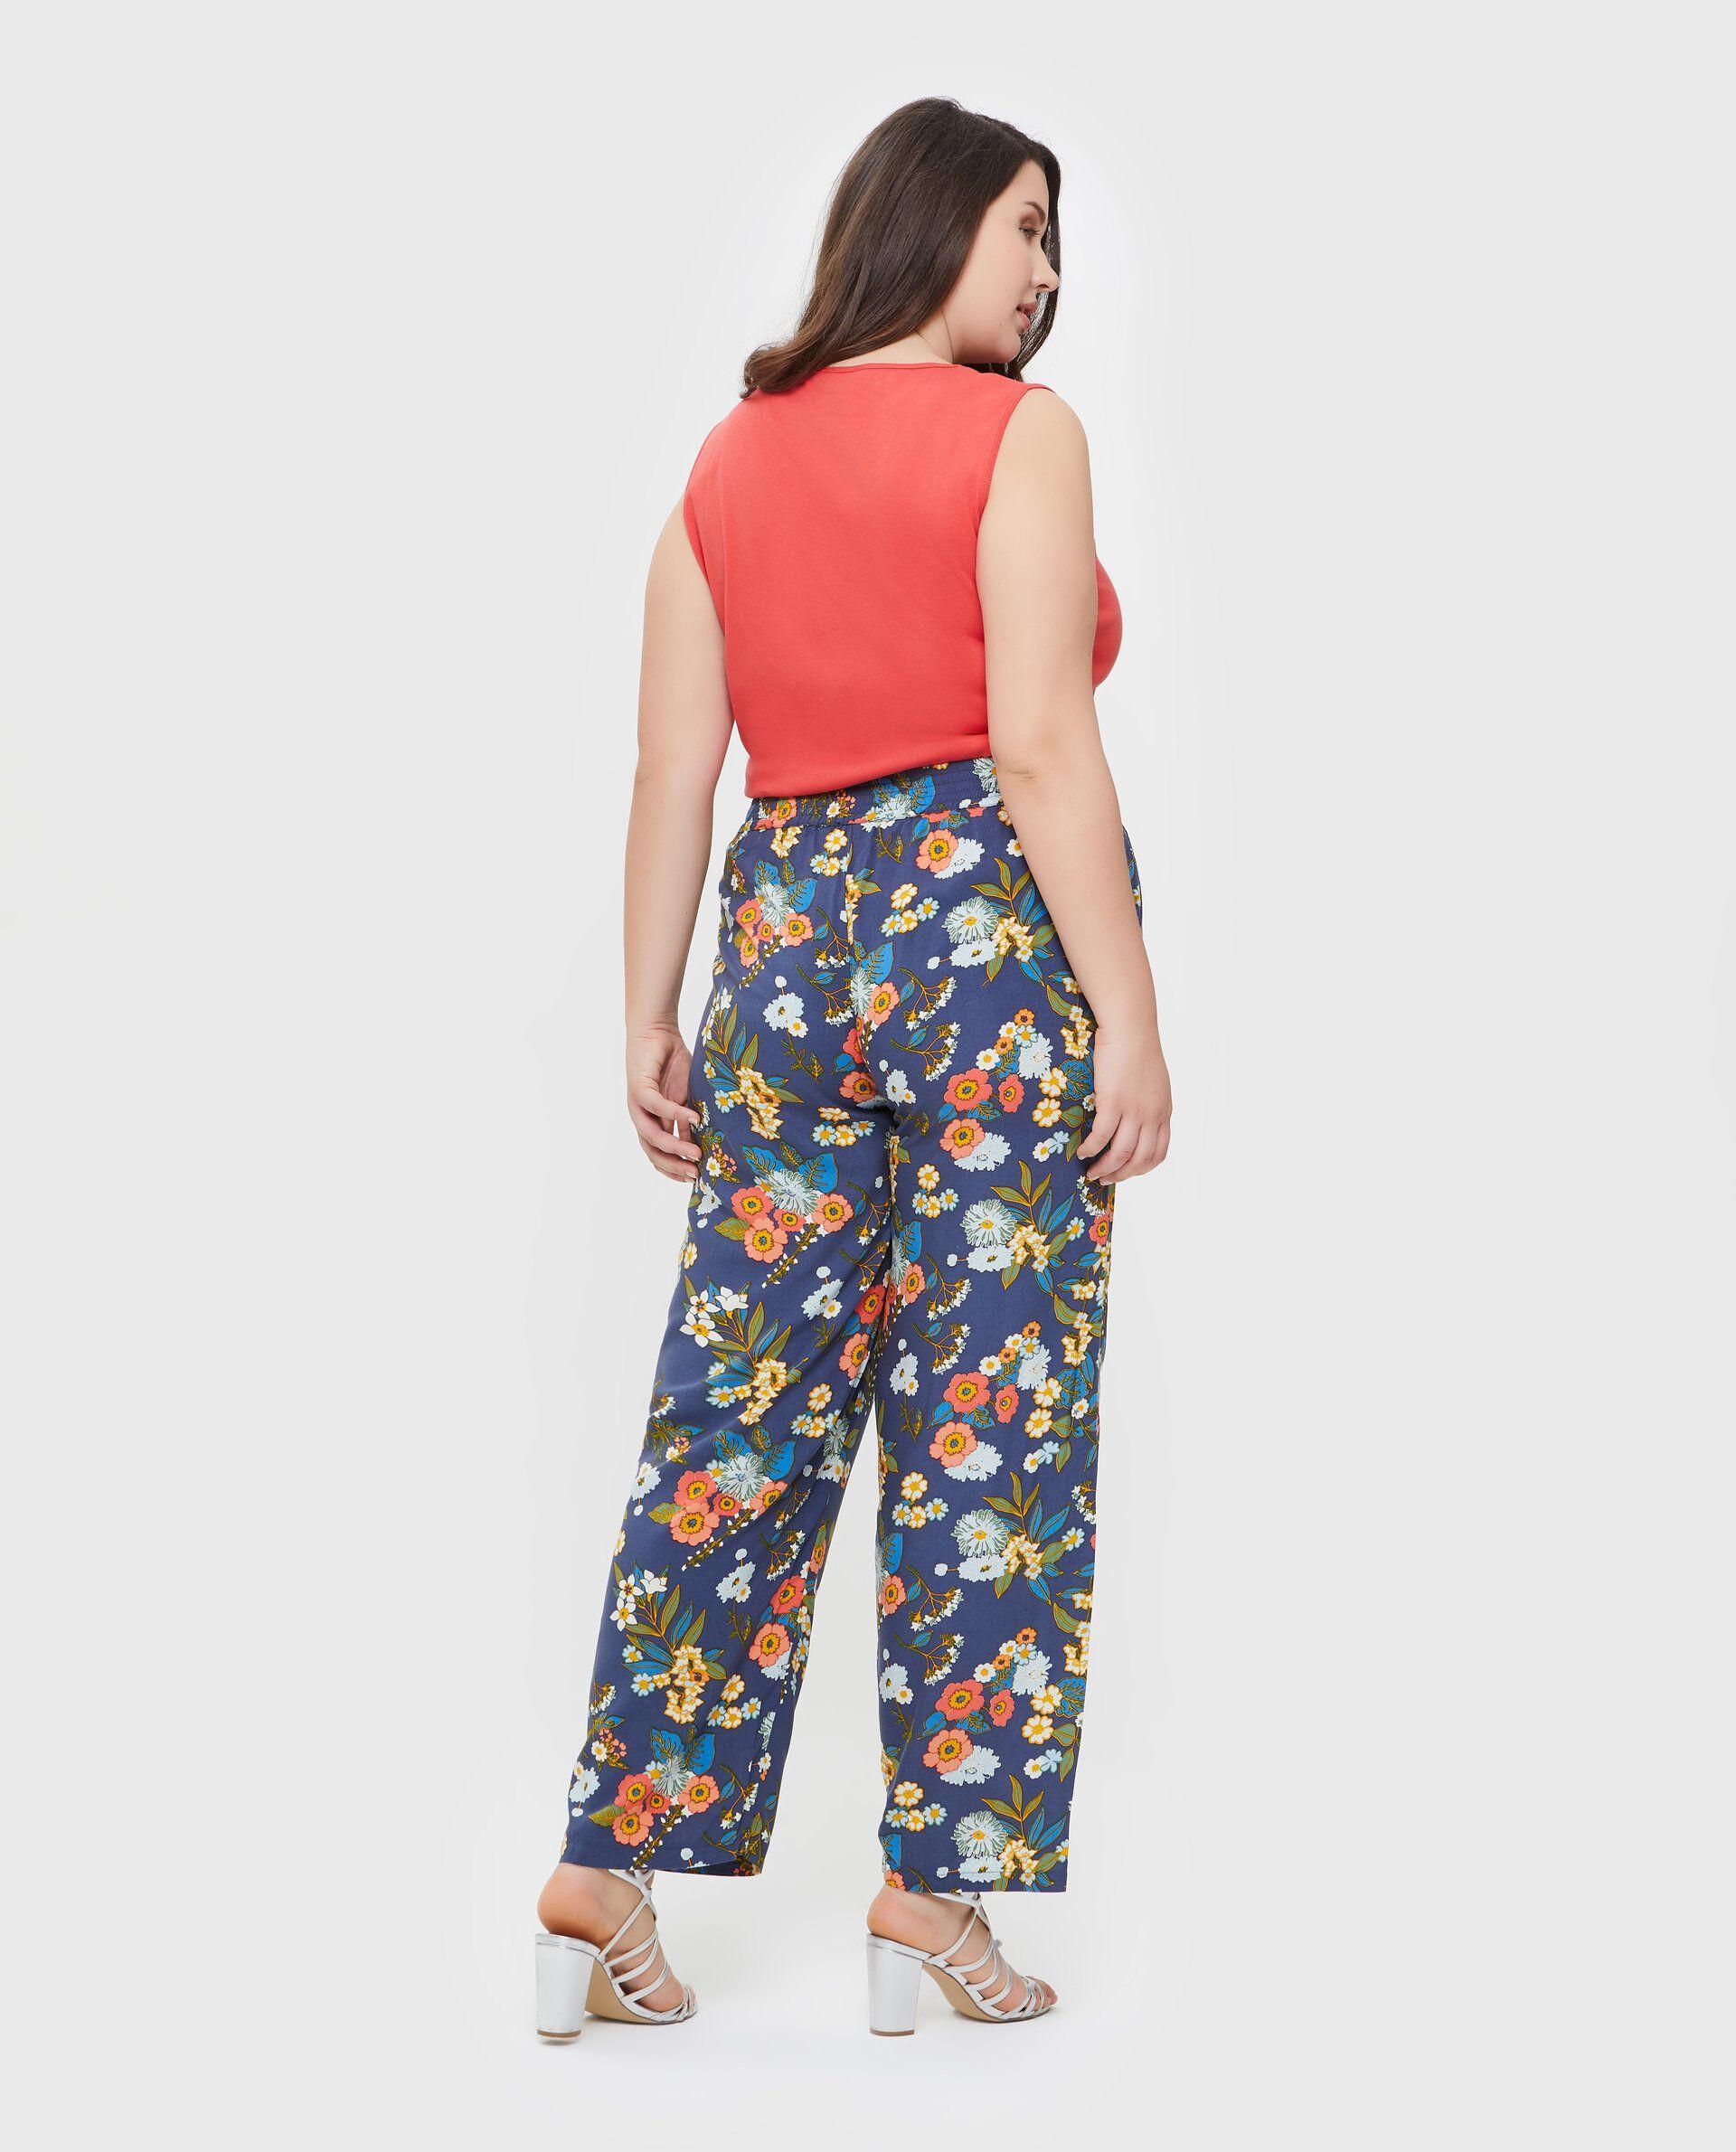 Pantaloni palazzo donna in pura viscosa Curvy